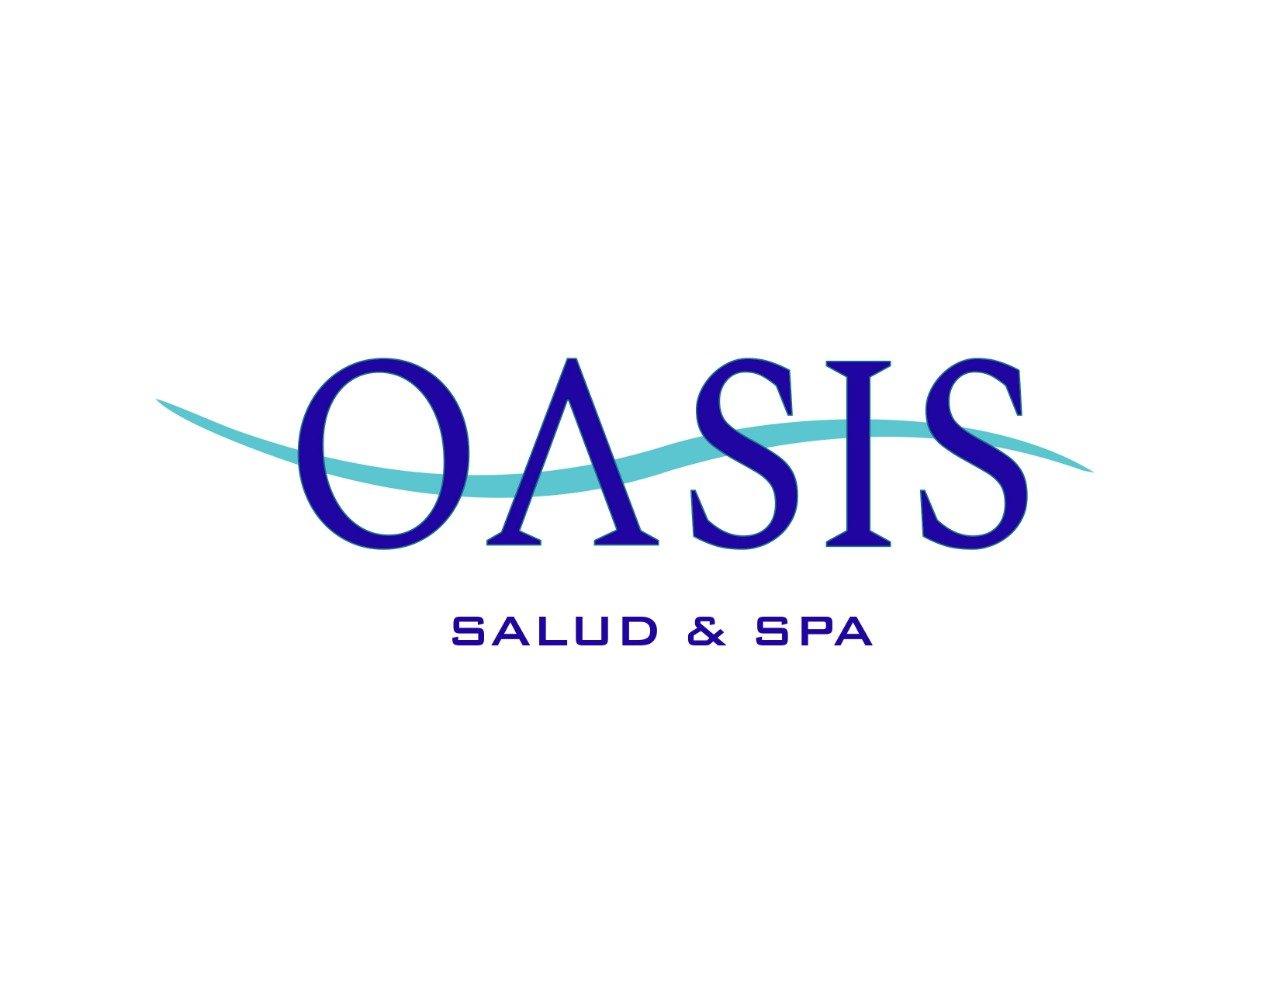 OASIS SALUD & SPA